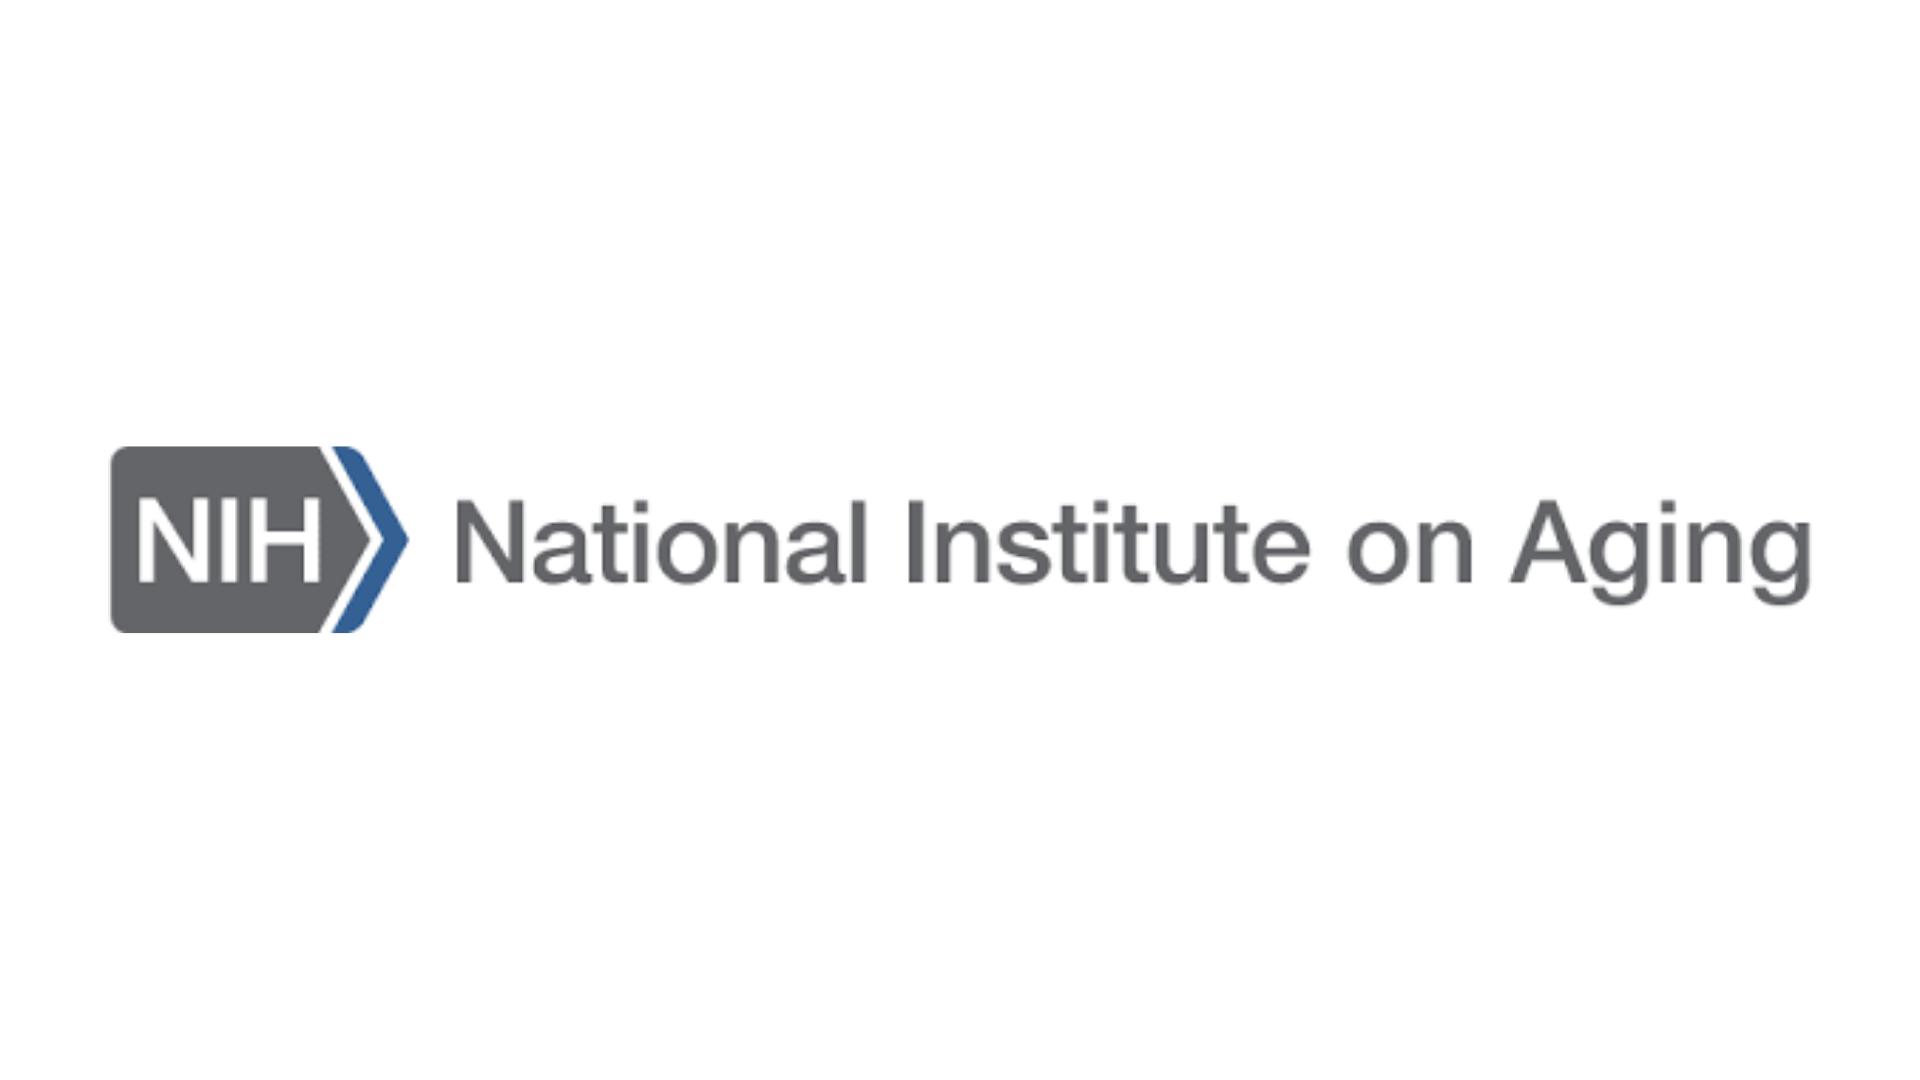 NIH Applicant Assistance Program